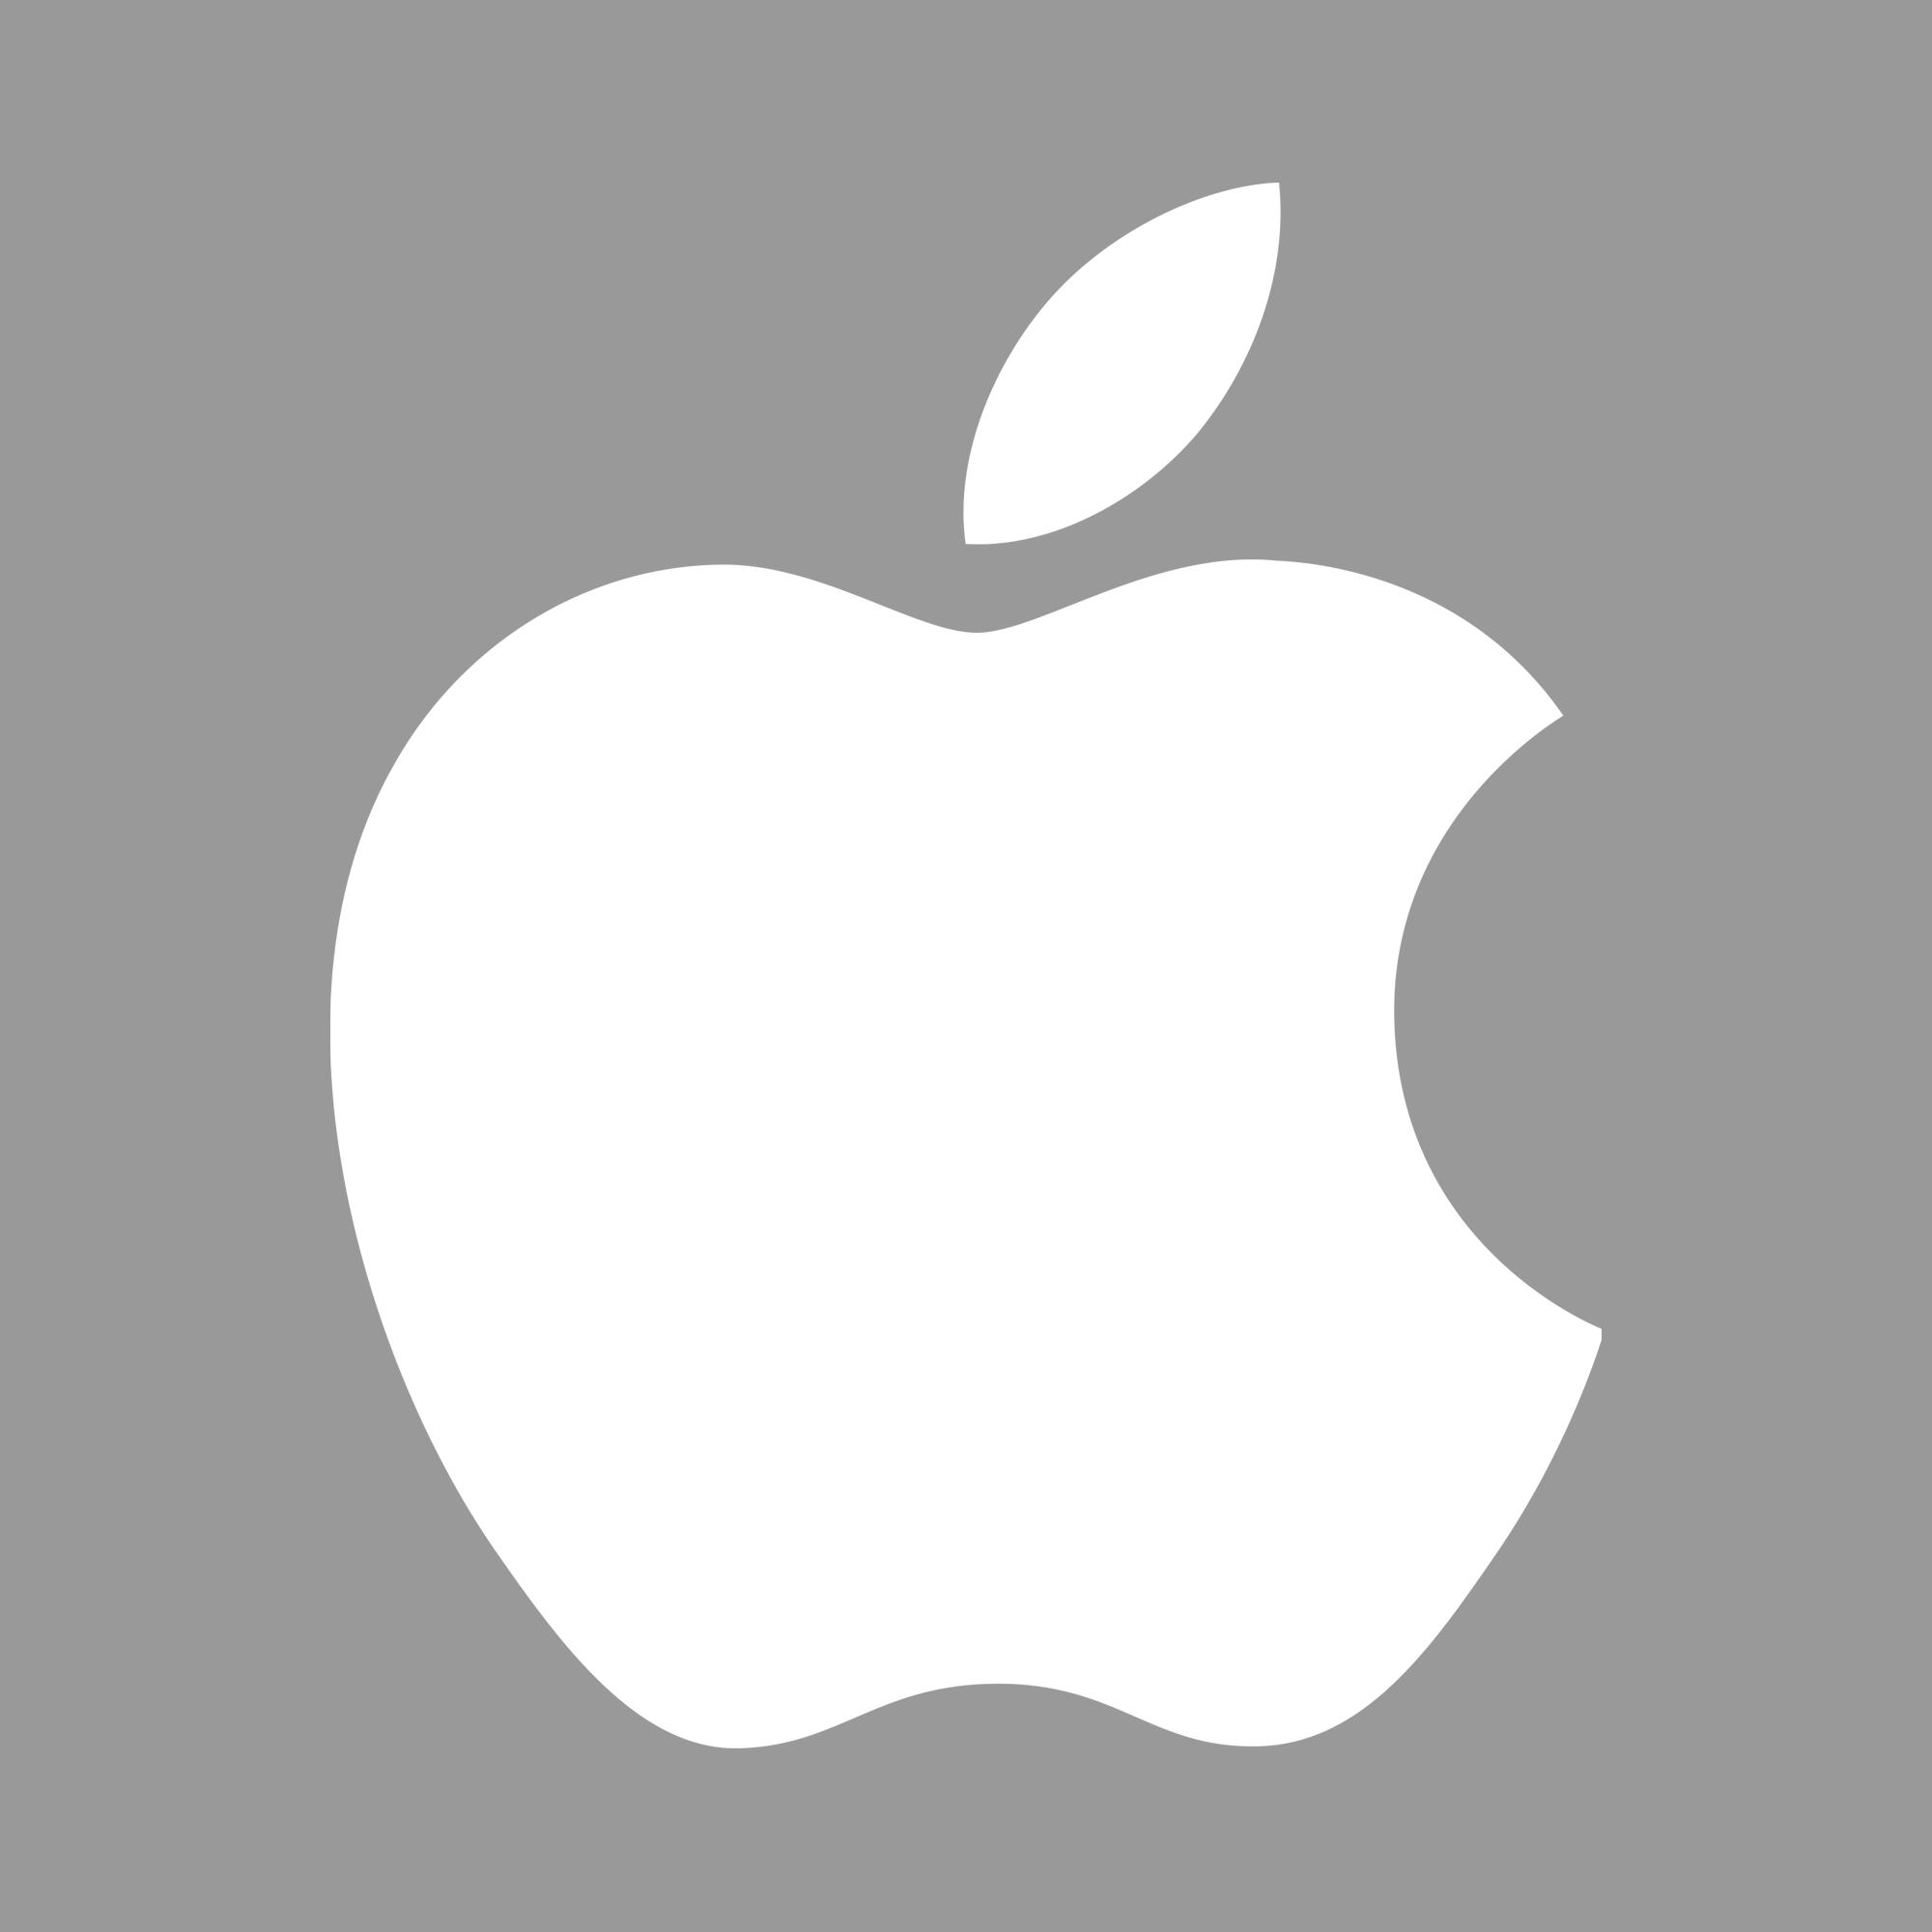 Apple LogoOfficial Apple Logo 2013